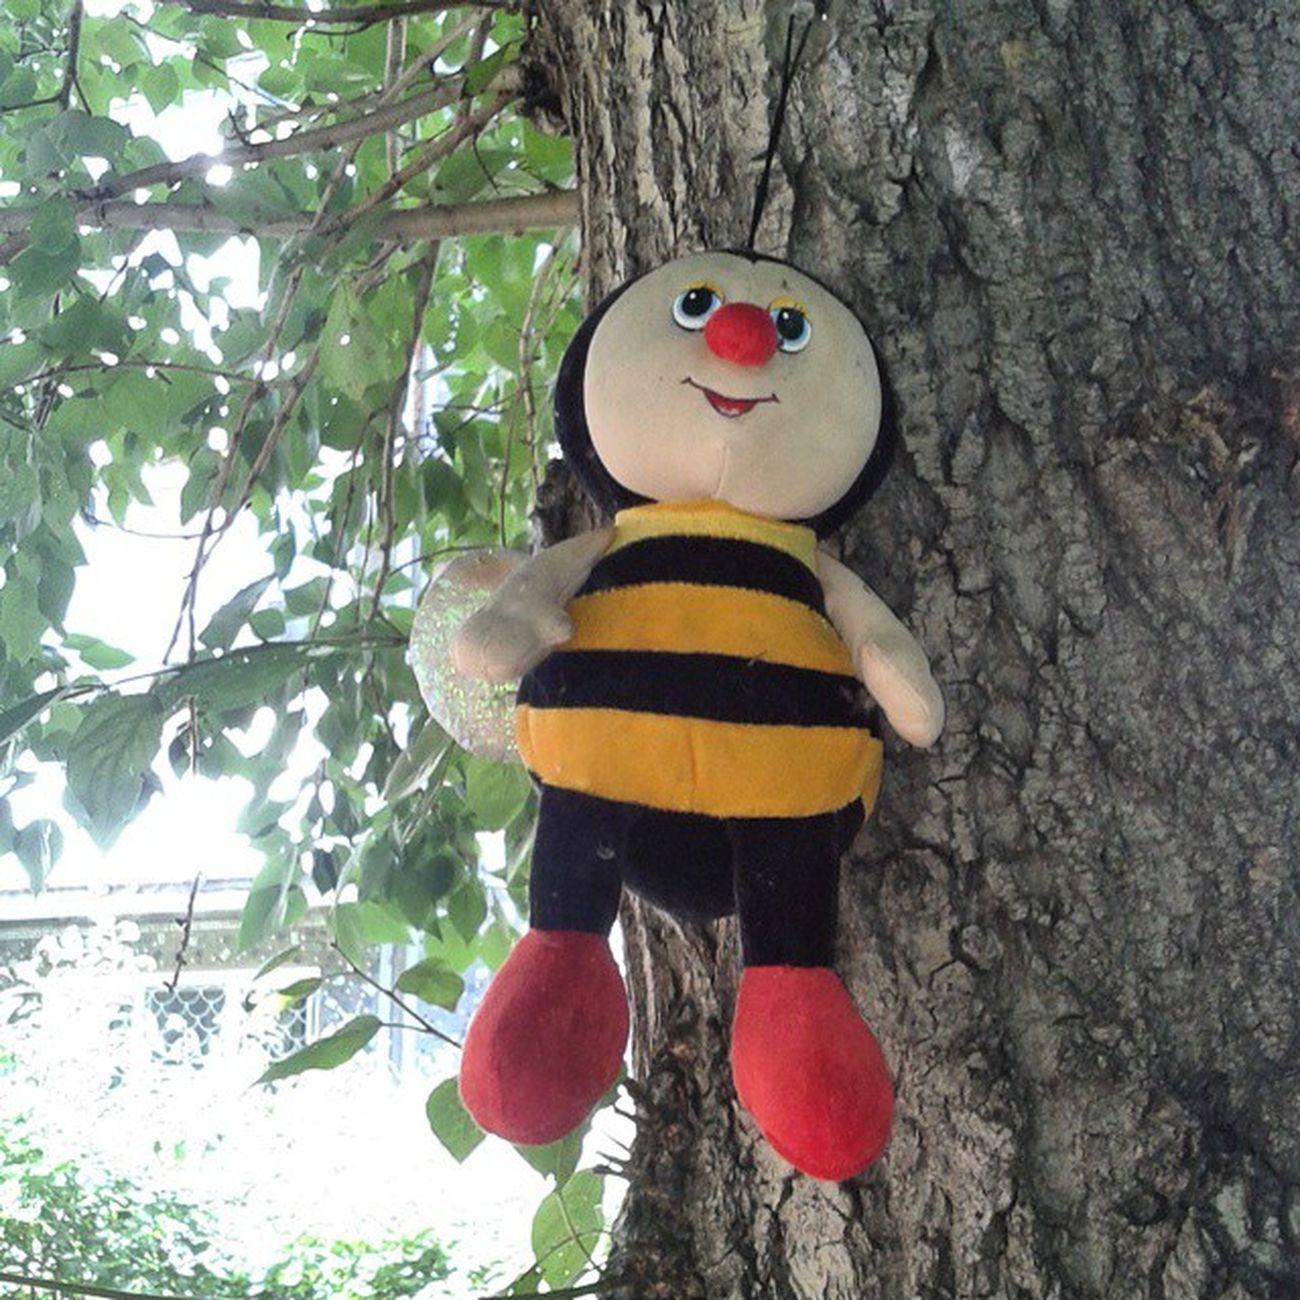 Относительно органично выглядит на дереве пчела. Но тоже ппц... омск сибирь пчела прибили к дереву садизм Bee Nail to tree Sadism Crusified